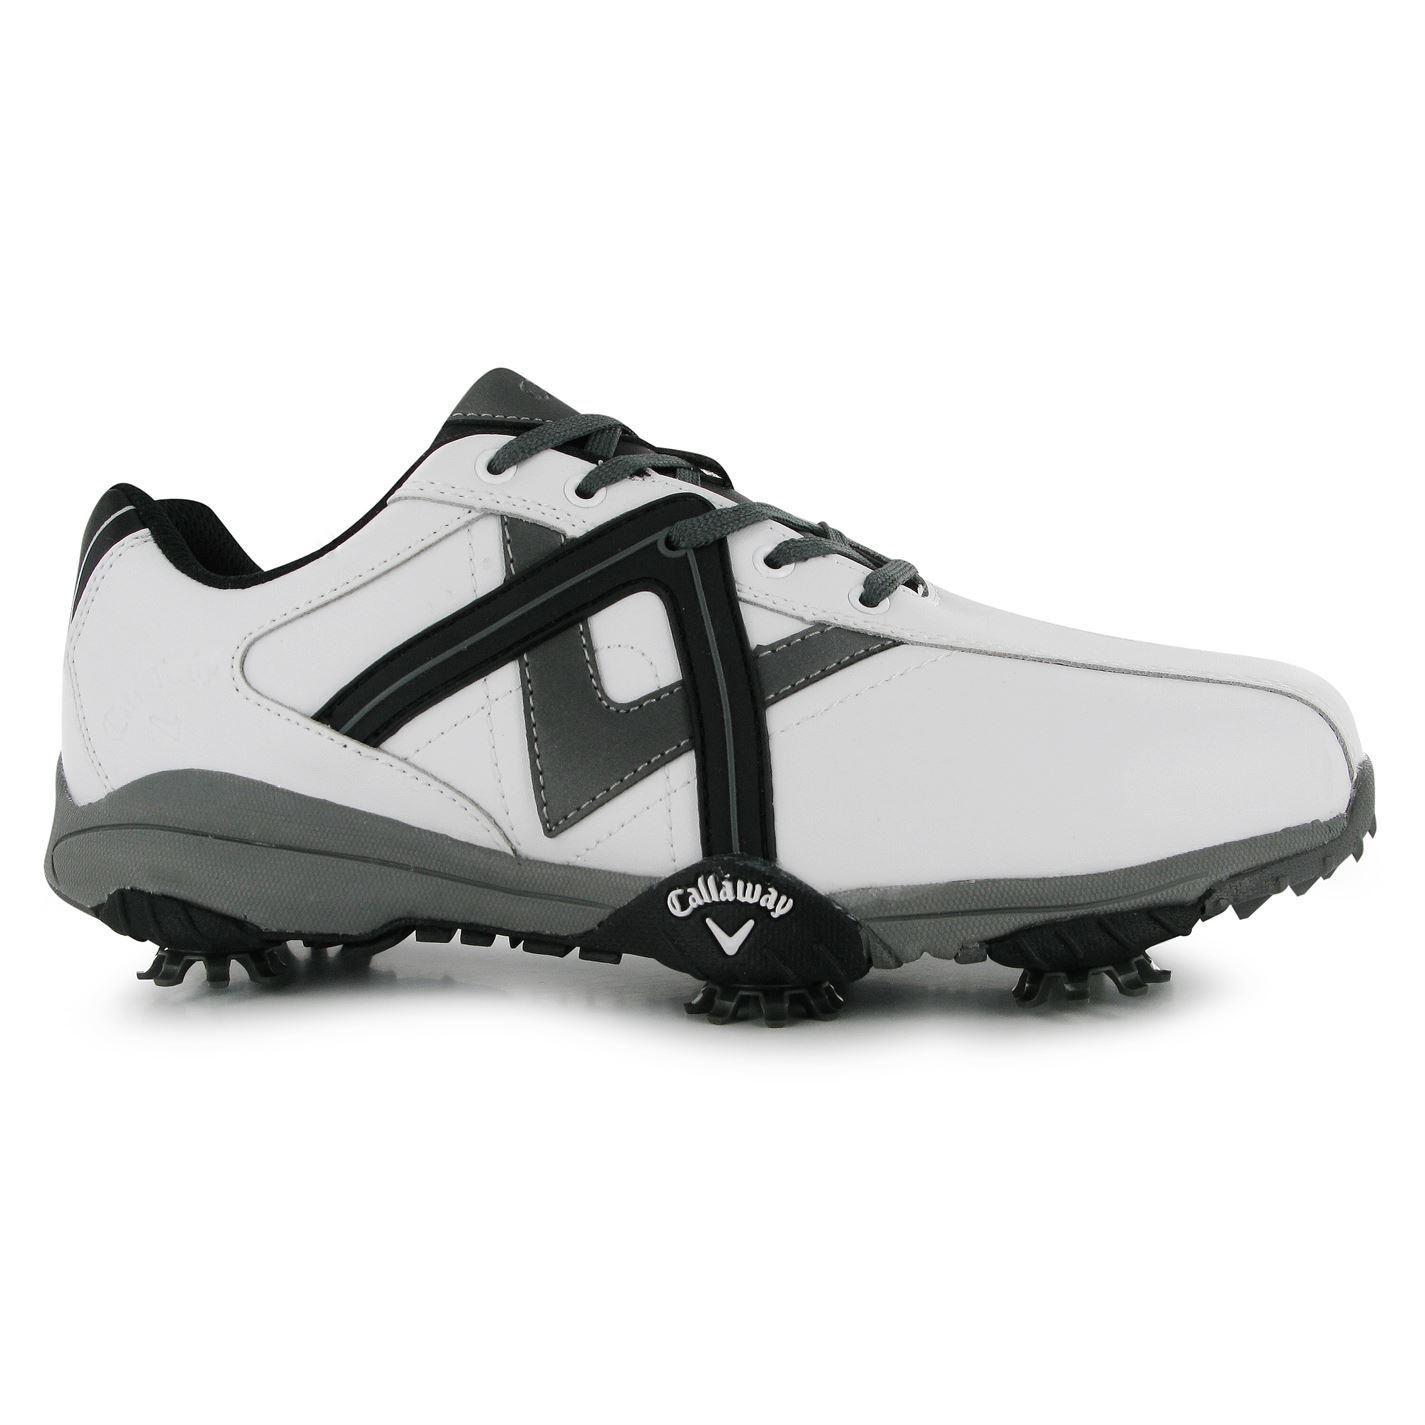 Callaway-Cheviot-ll-Golf-Shoes-Mens-Spikes-Footwear thumbnail 10